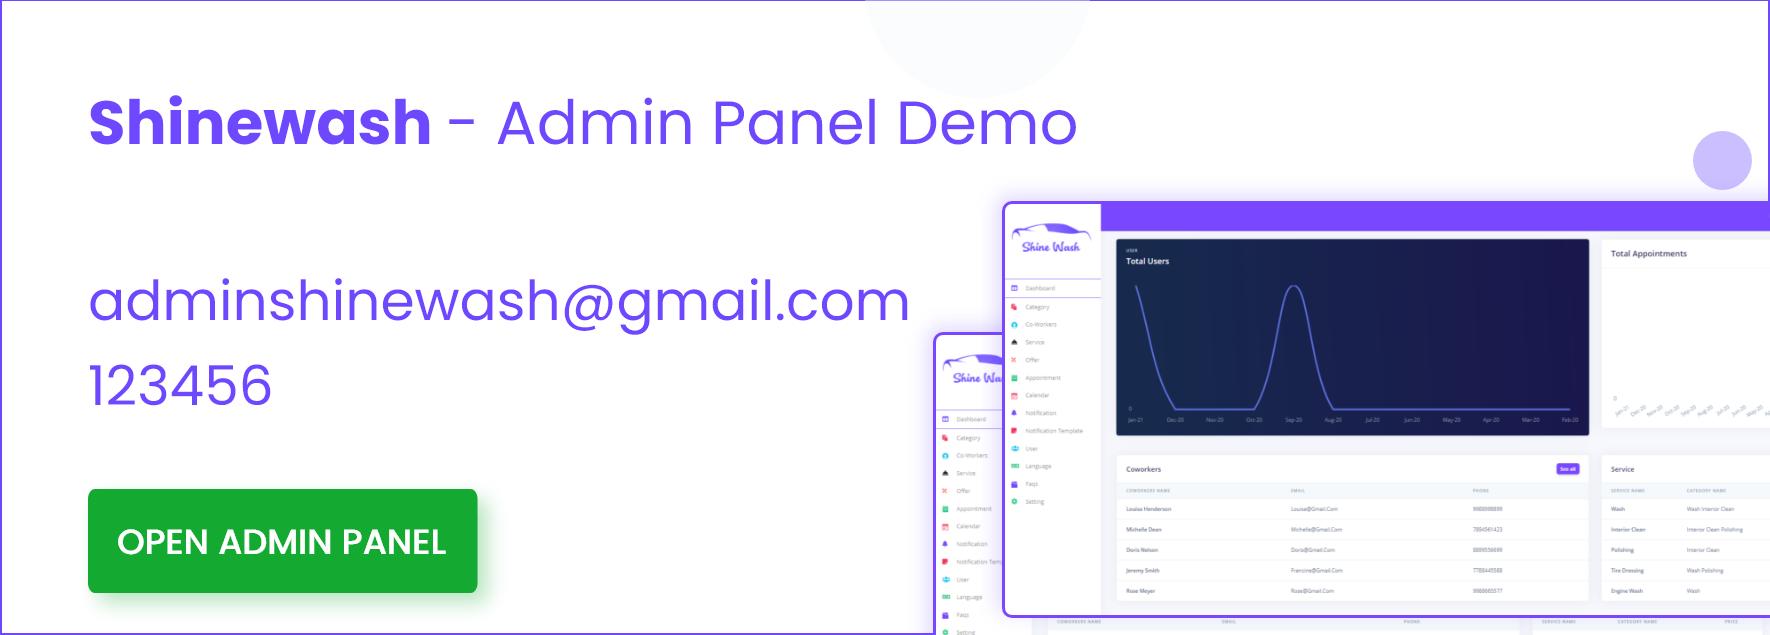 Admin-panel-demo